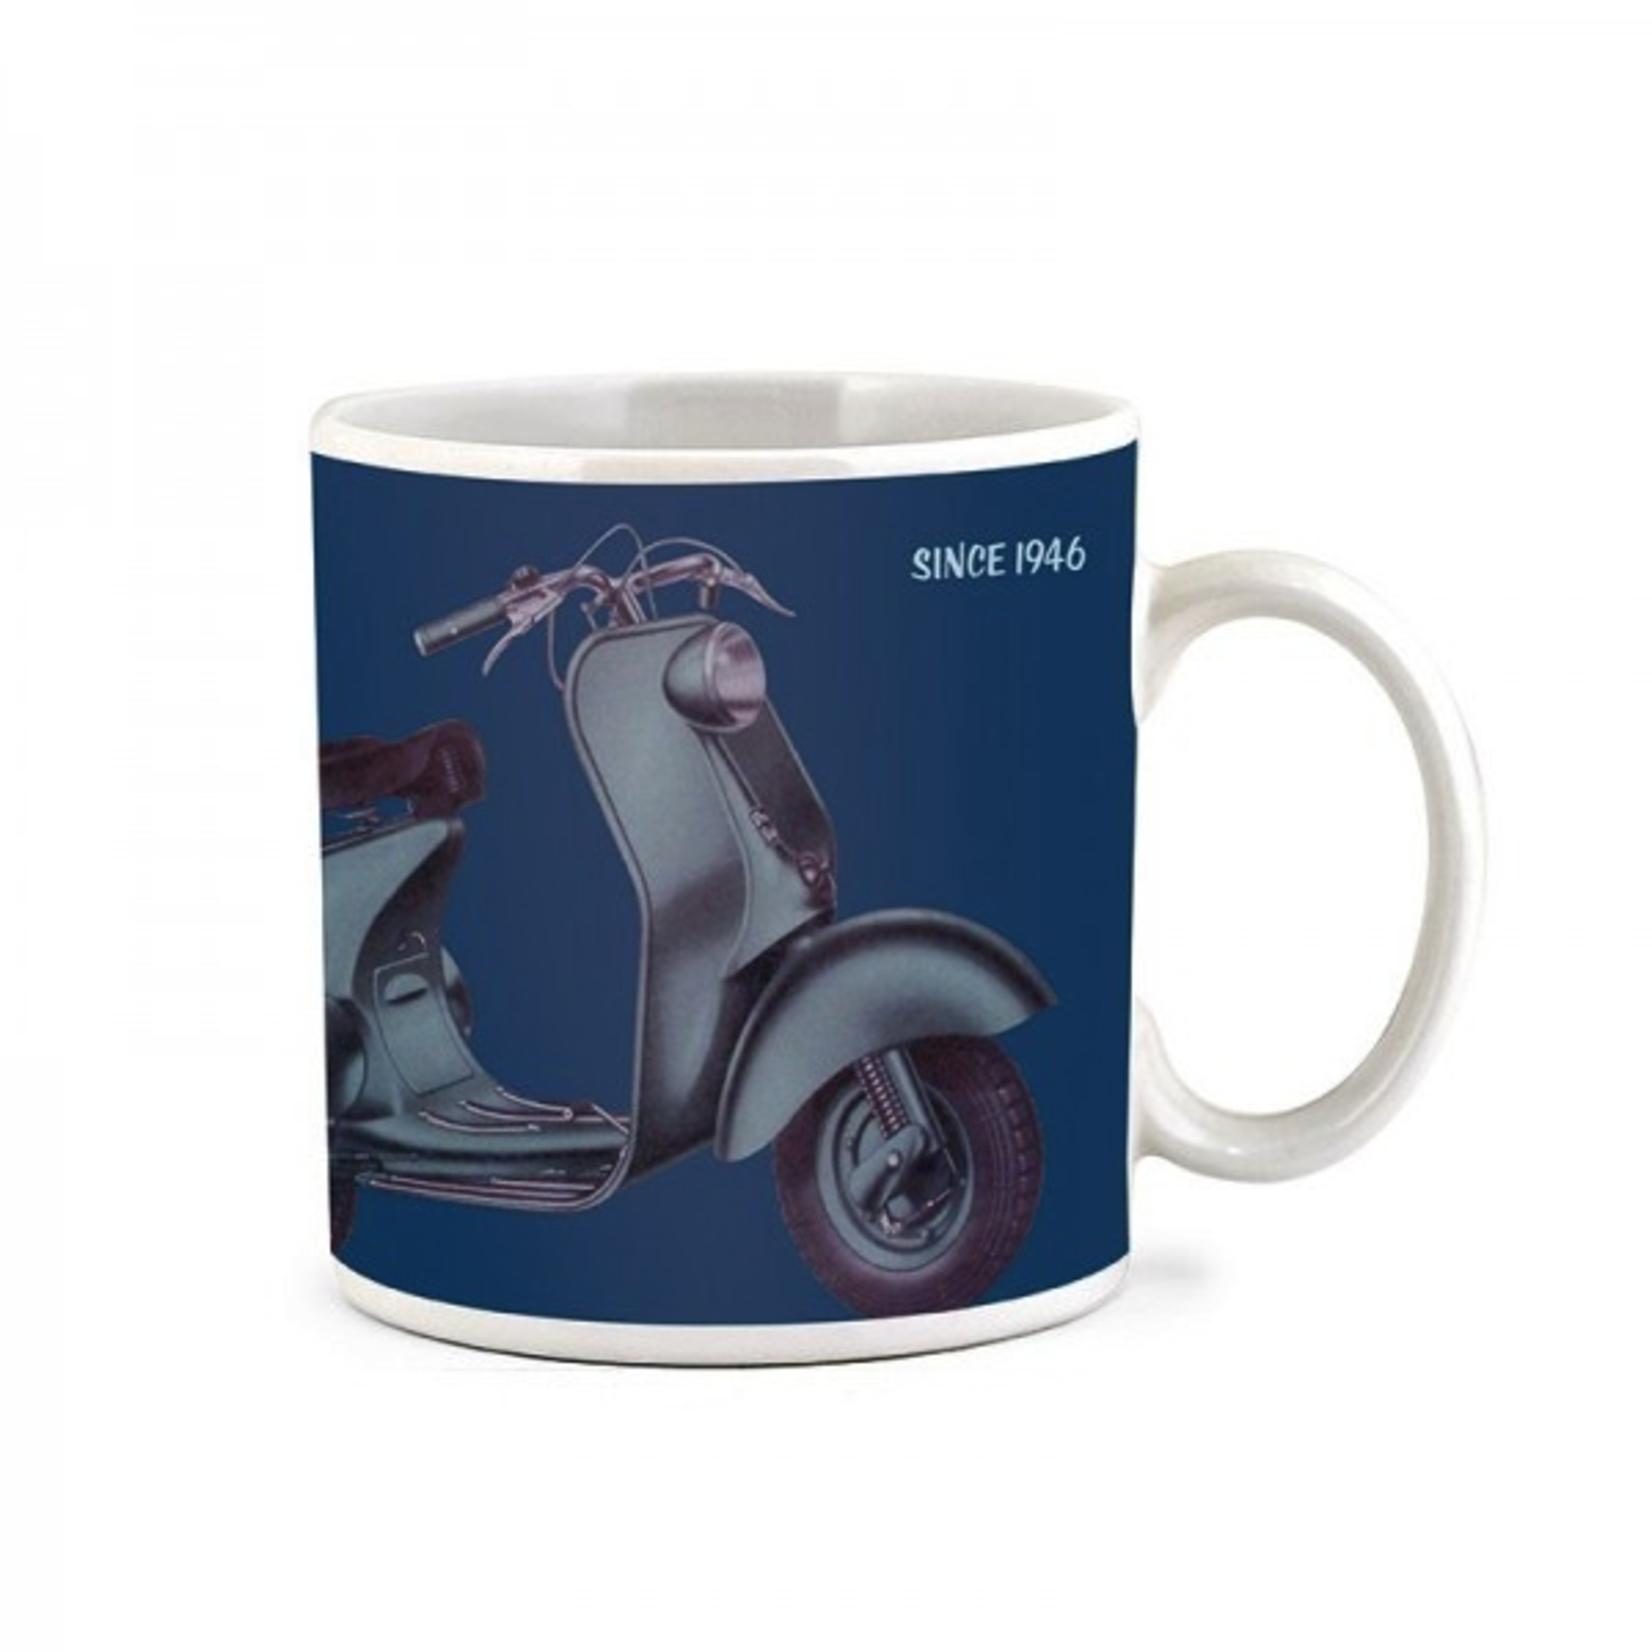 "Lifestyle Mug, Get Ahead On A Vespa"""